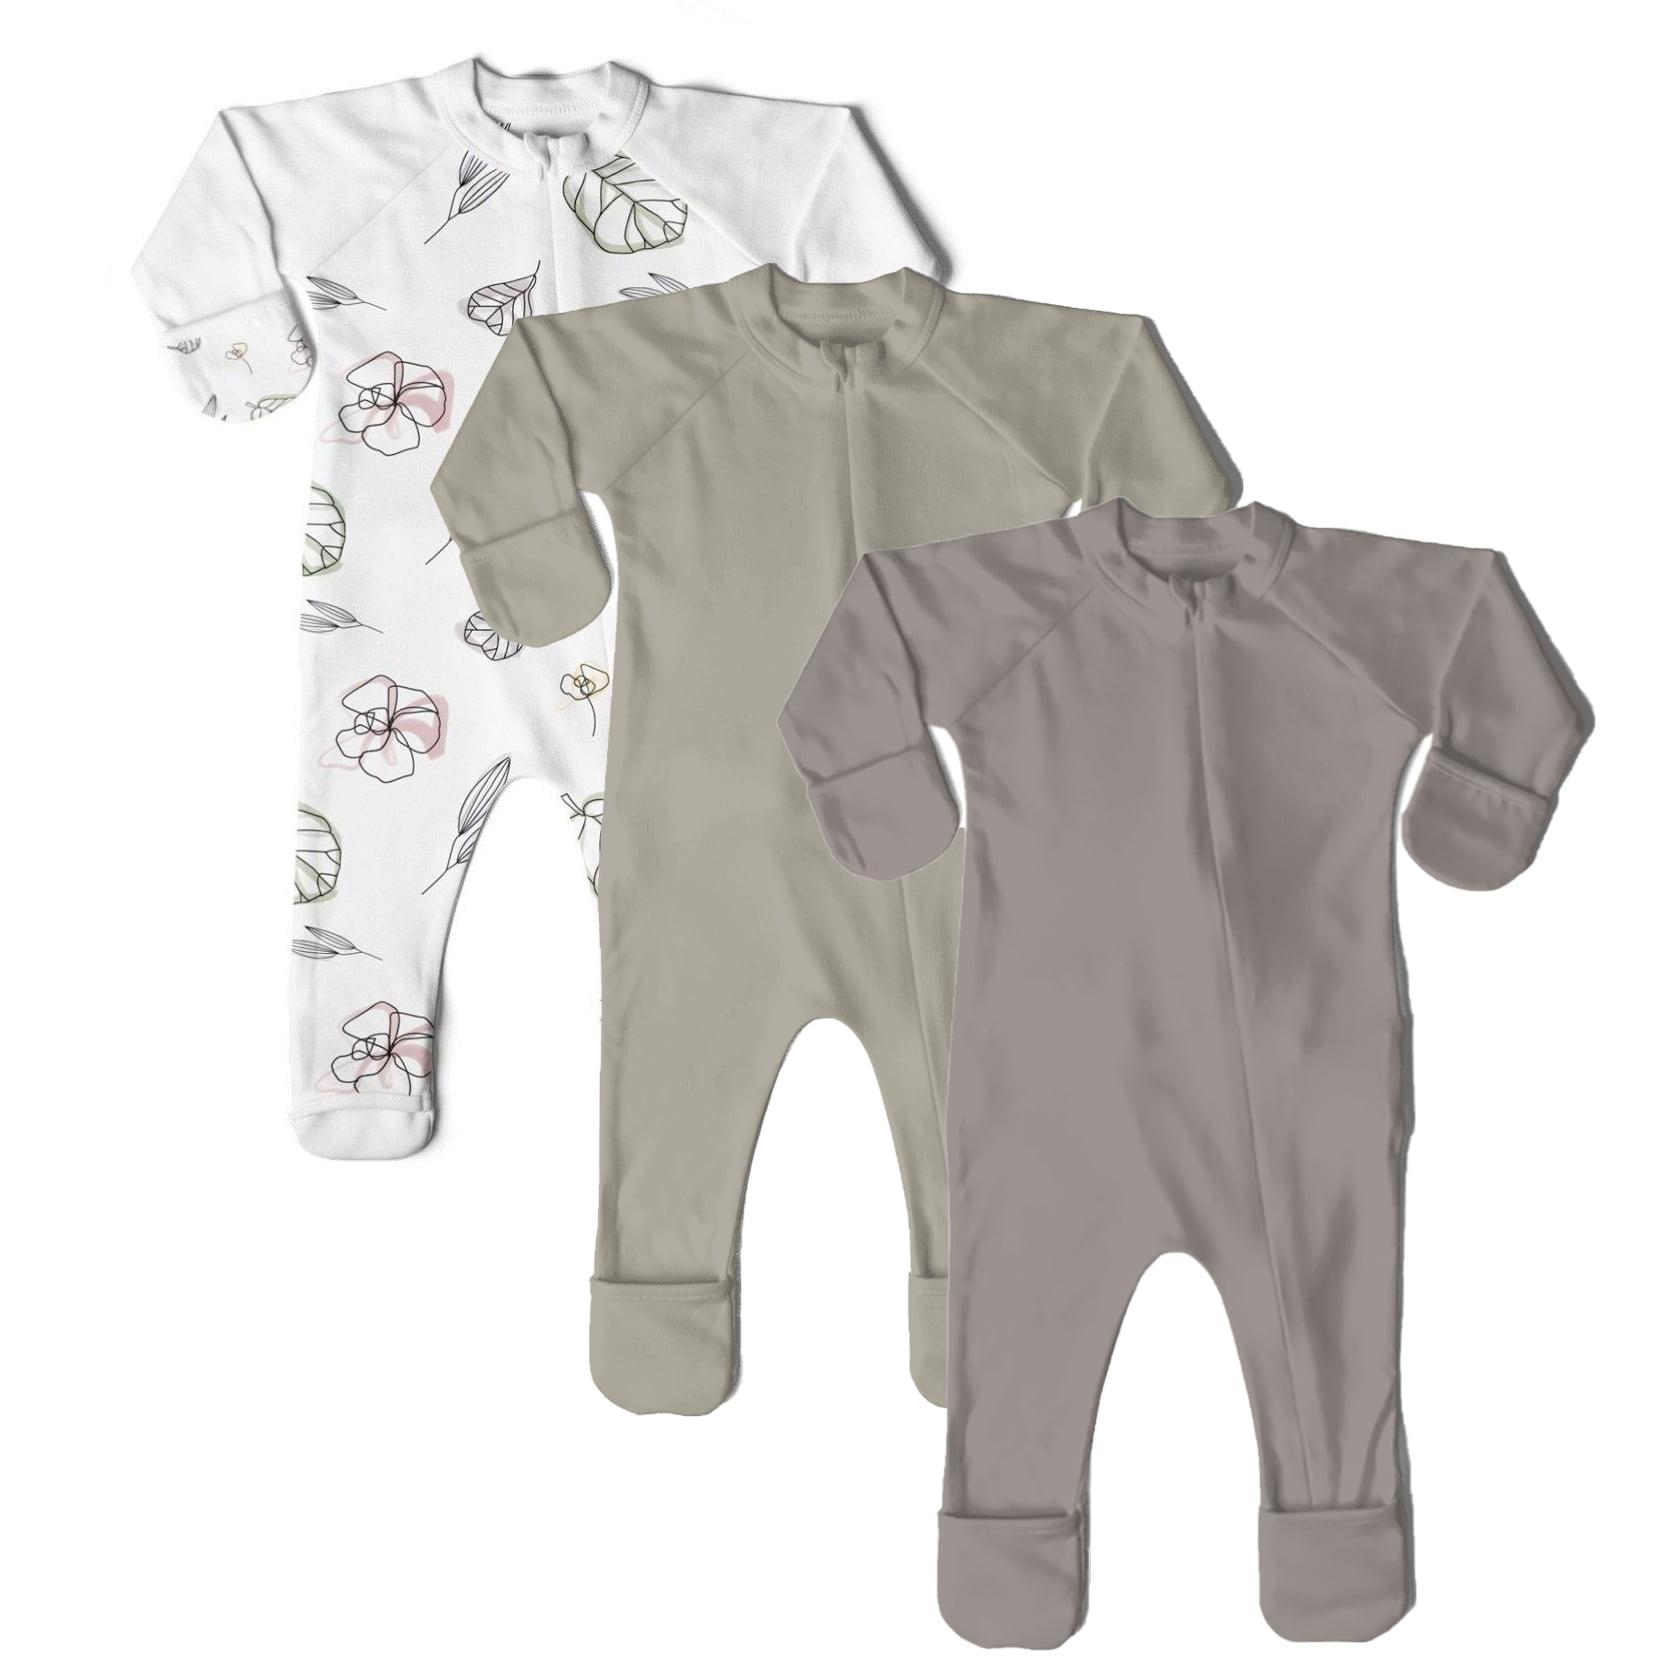 Goumikids Unisex Baby Footie Pajamas Organic Sock Sleeper Clothes 18-24M Moss